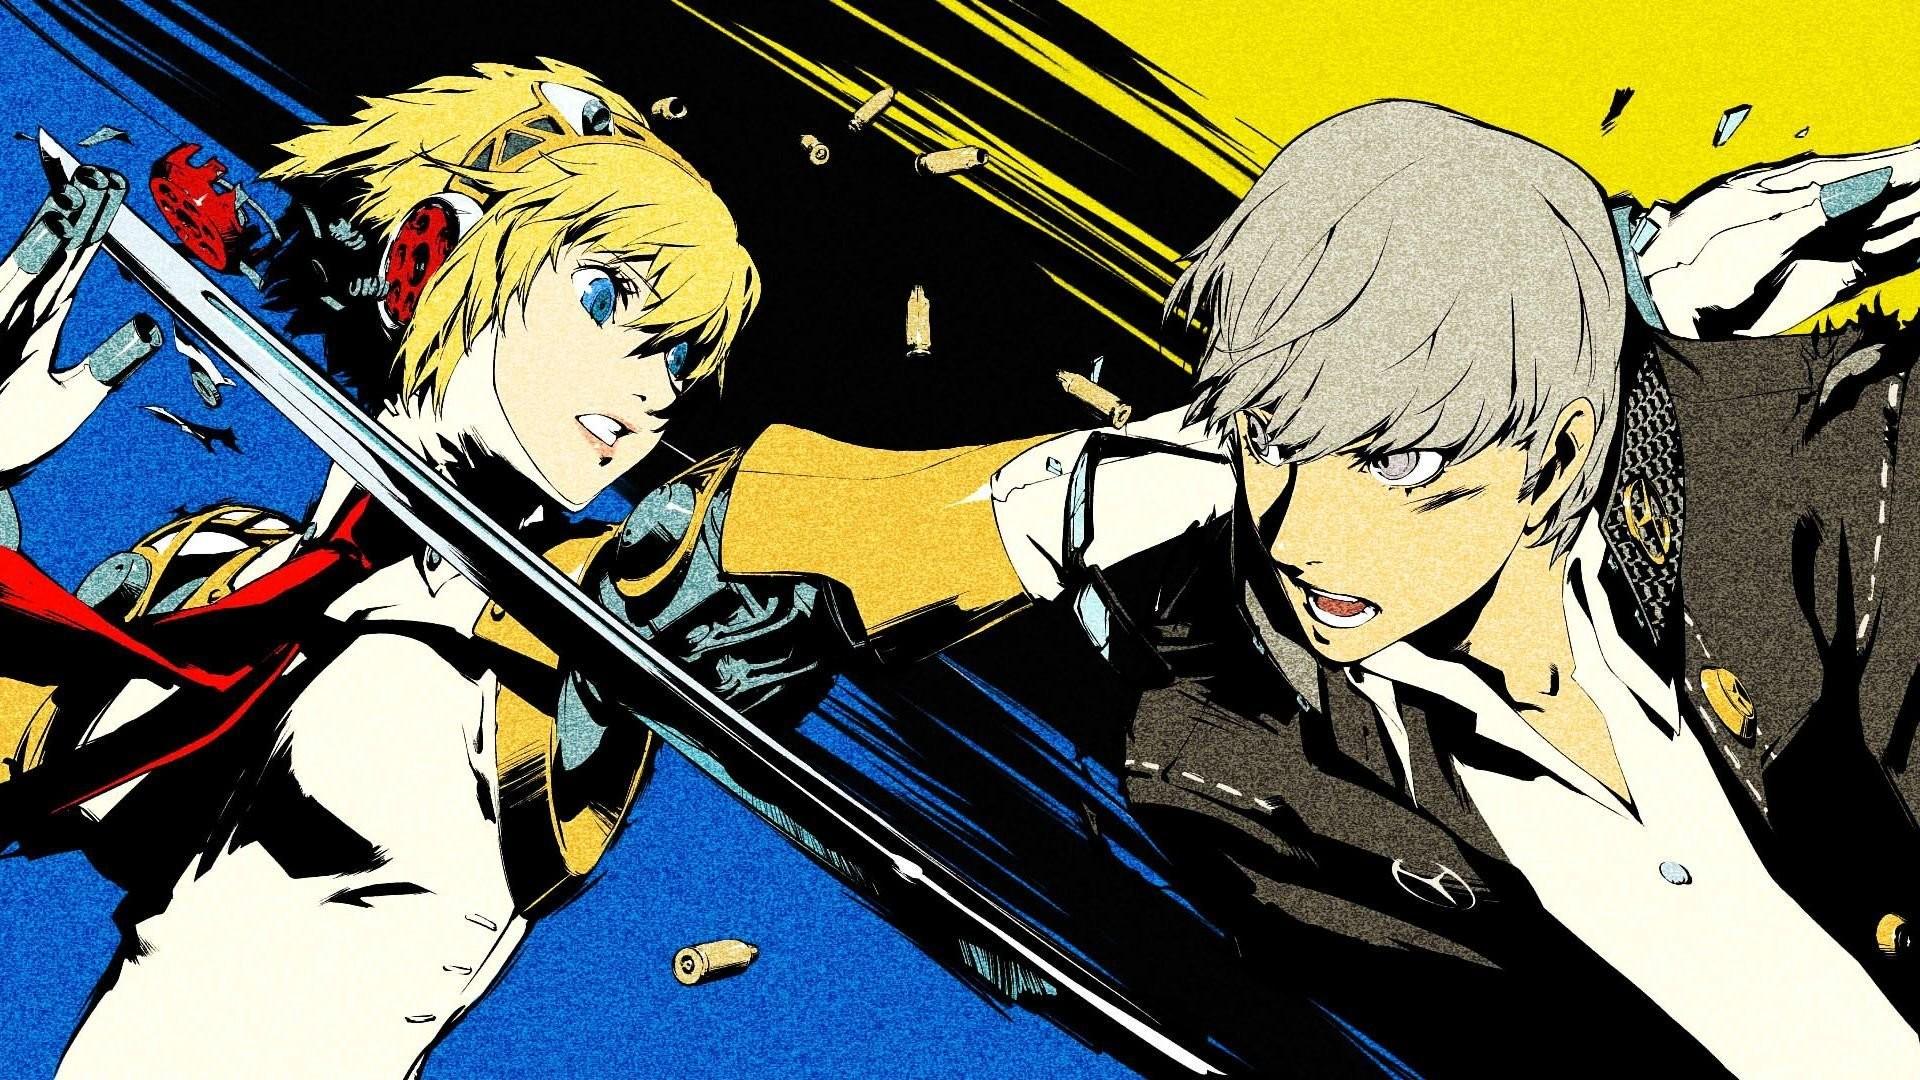 Narukami Yuu And Aigis – Persona 4